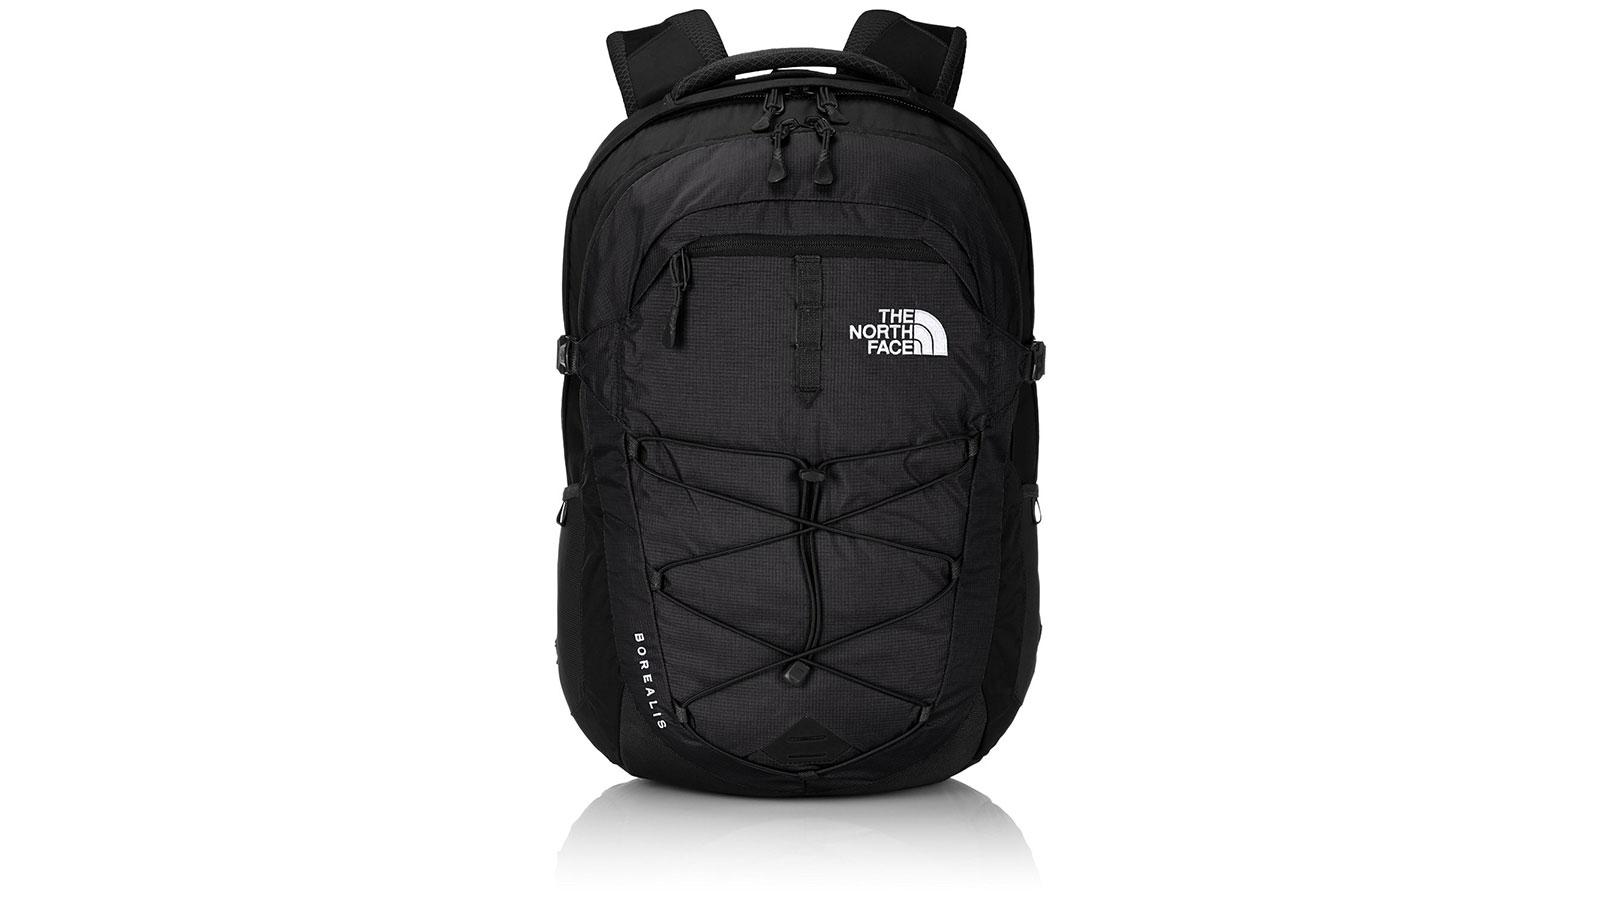 The North Face Unisex Borealis Laptop Backpack | best laptop bags for men